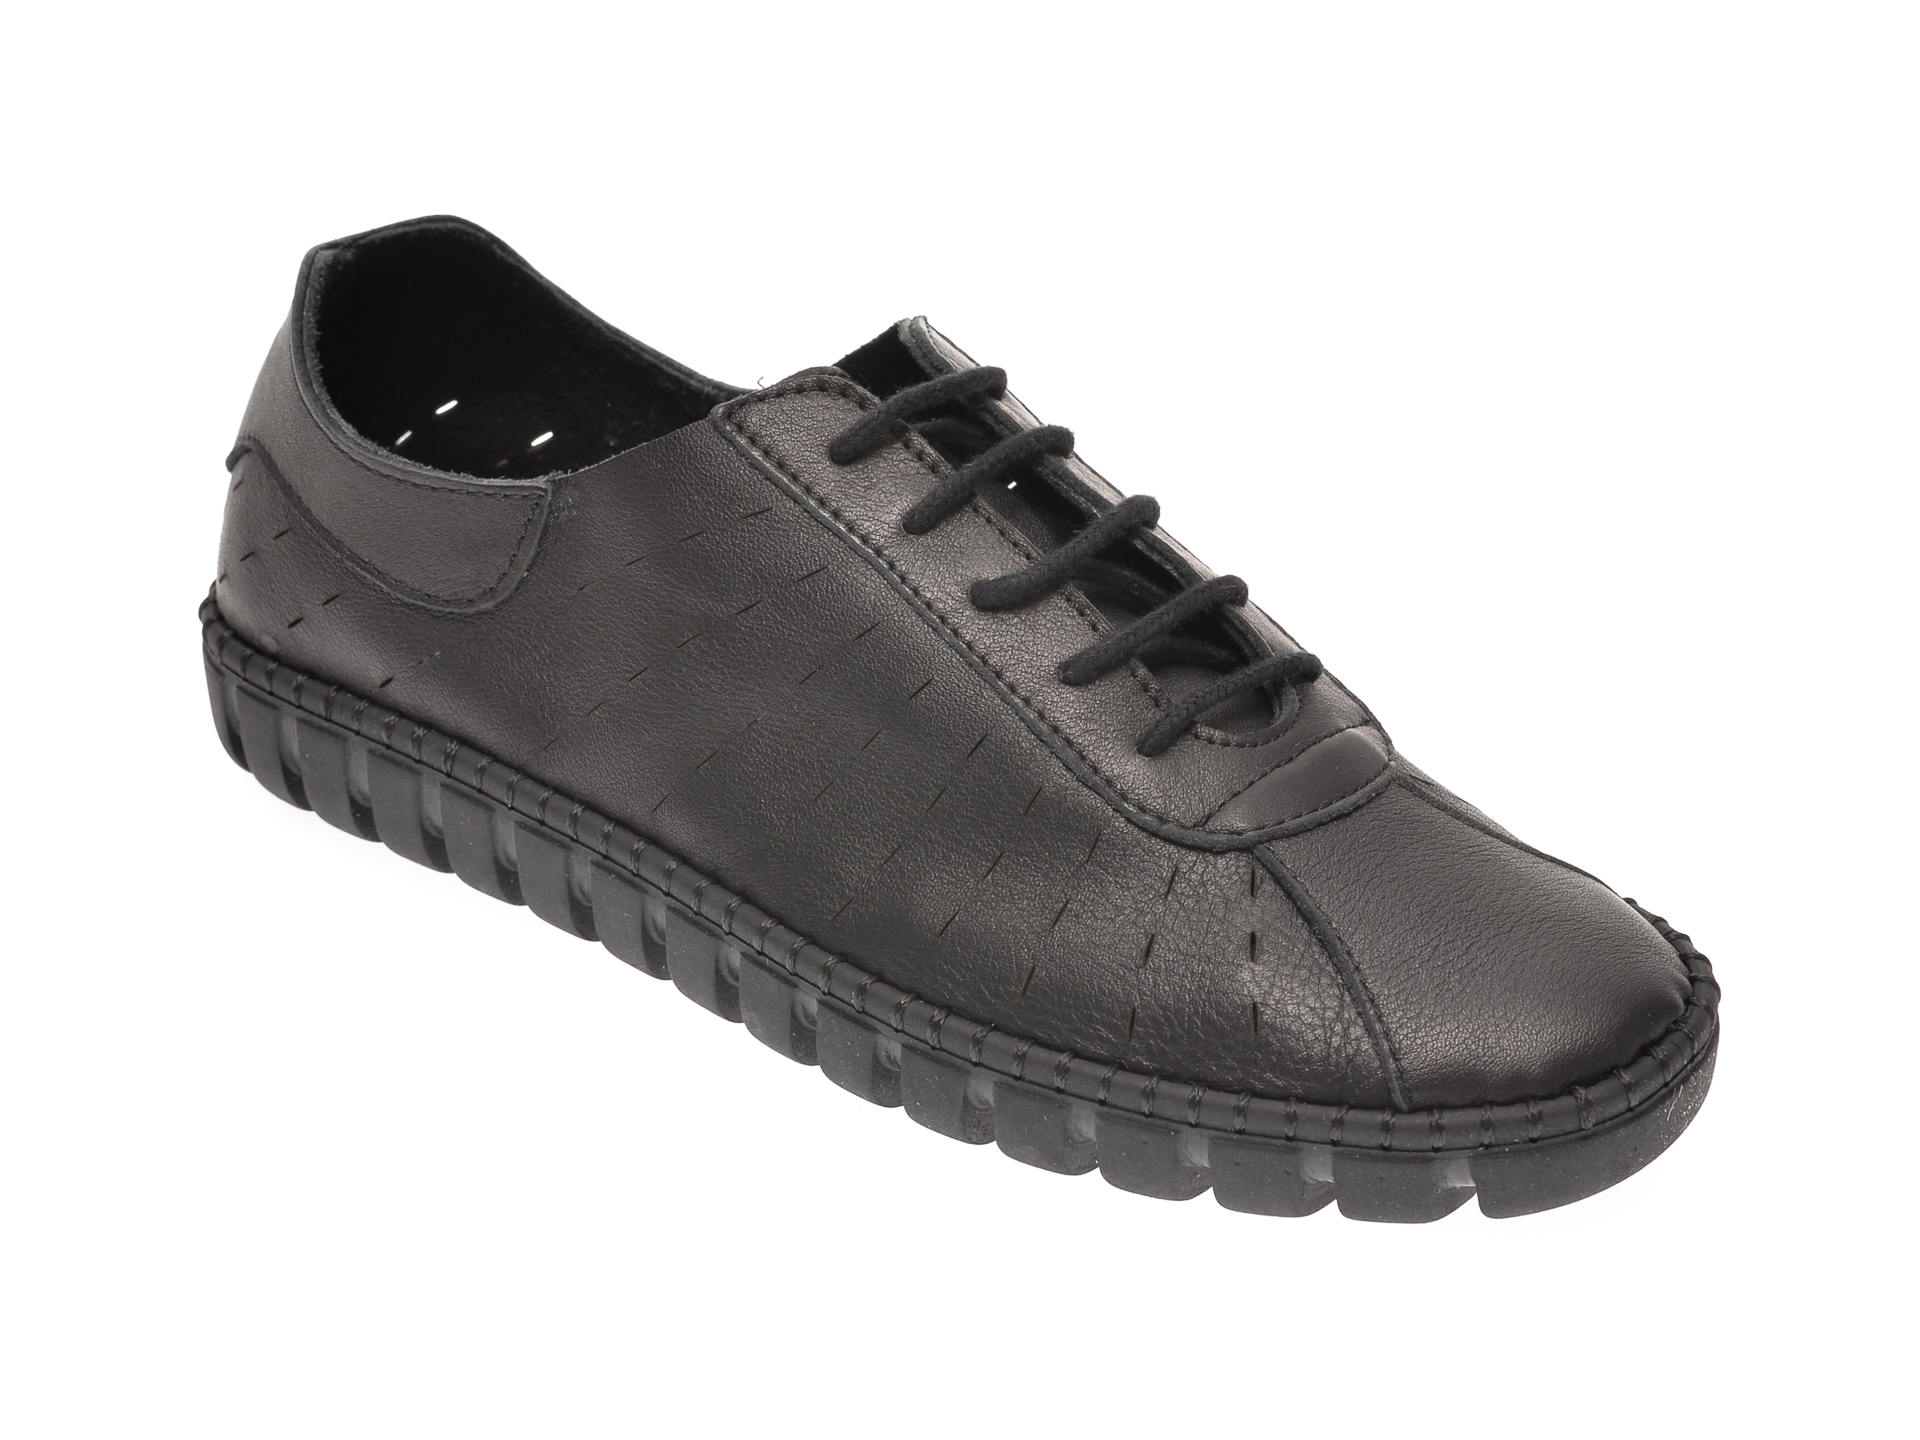 Pantofi PAVARELLA negri, 6020, din piele naturala